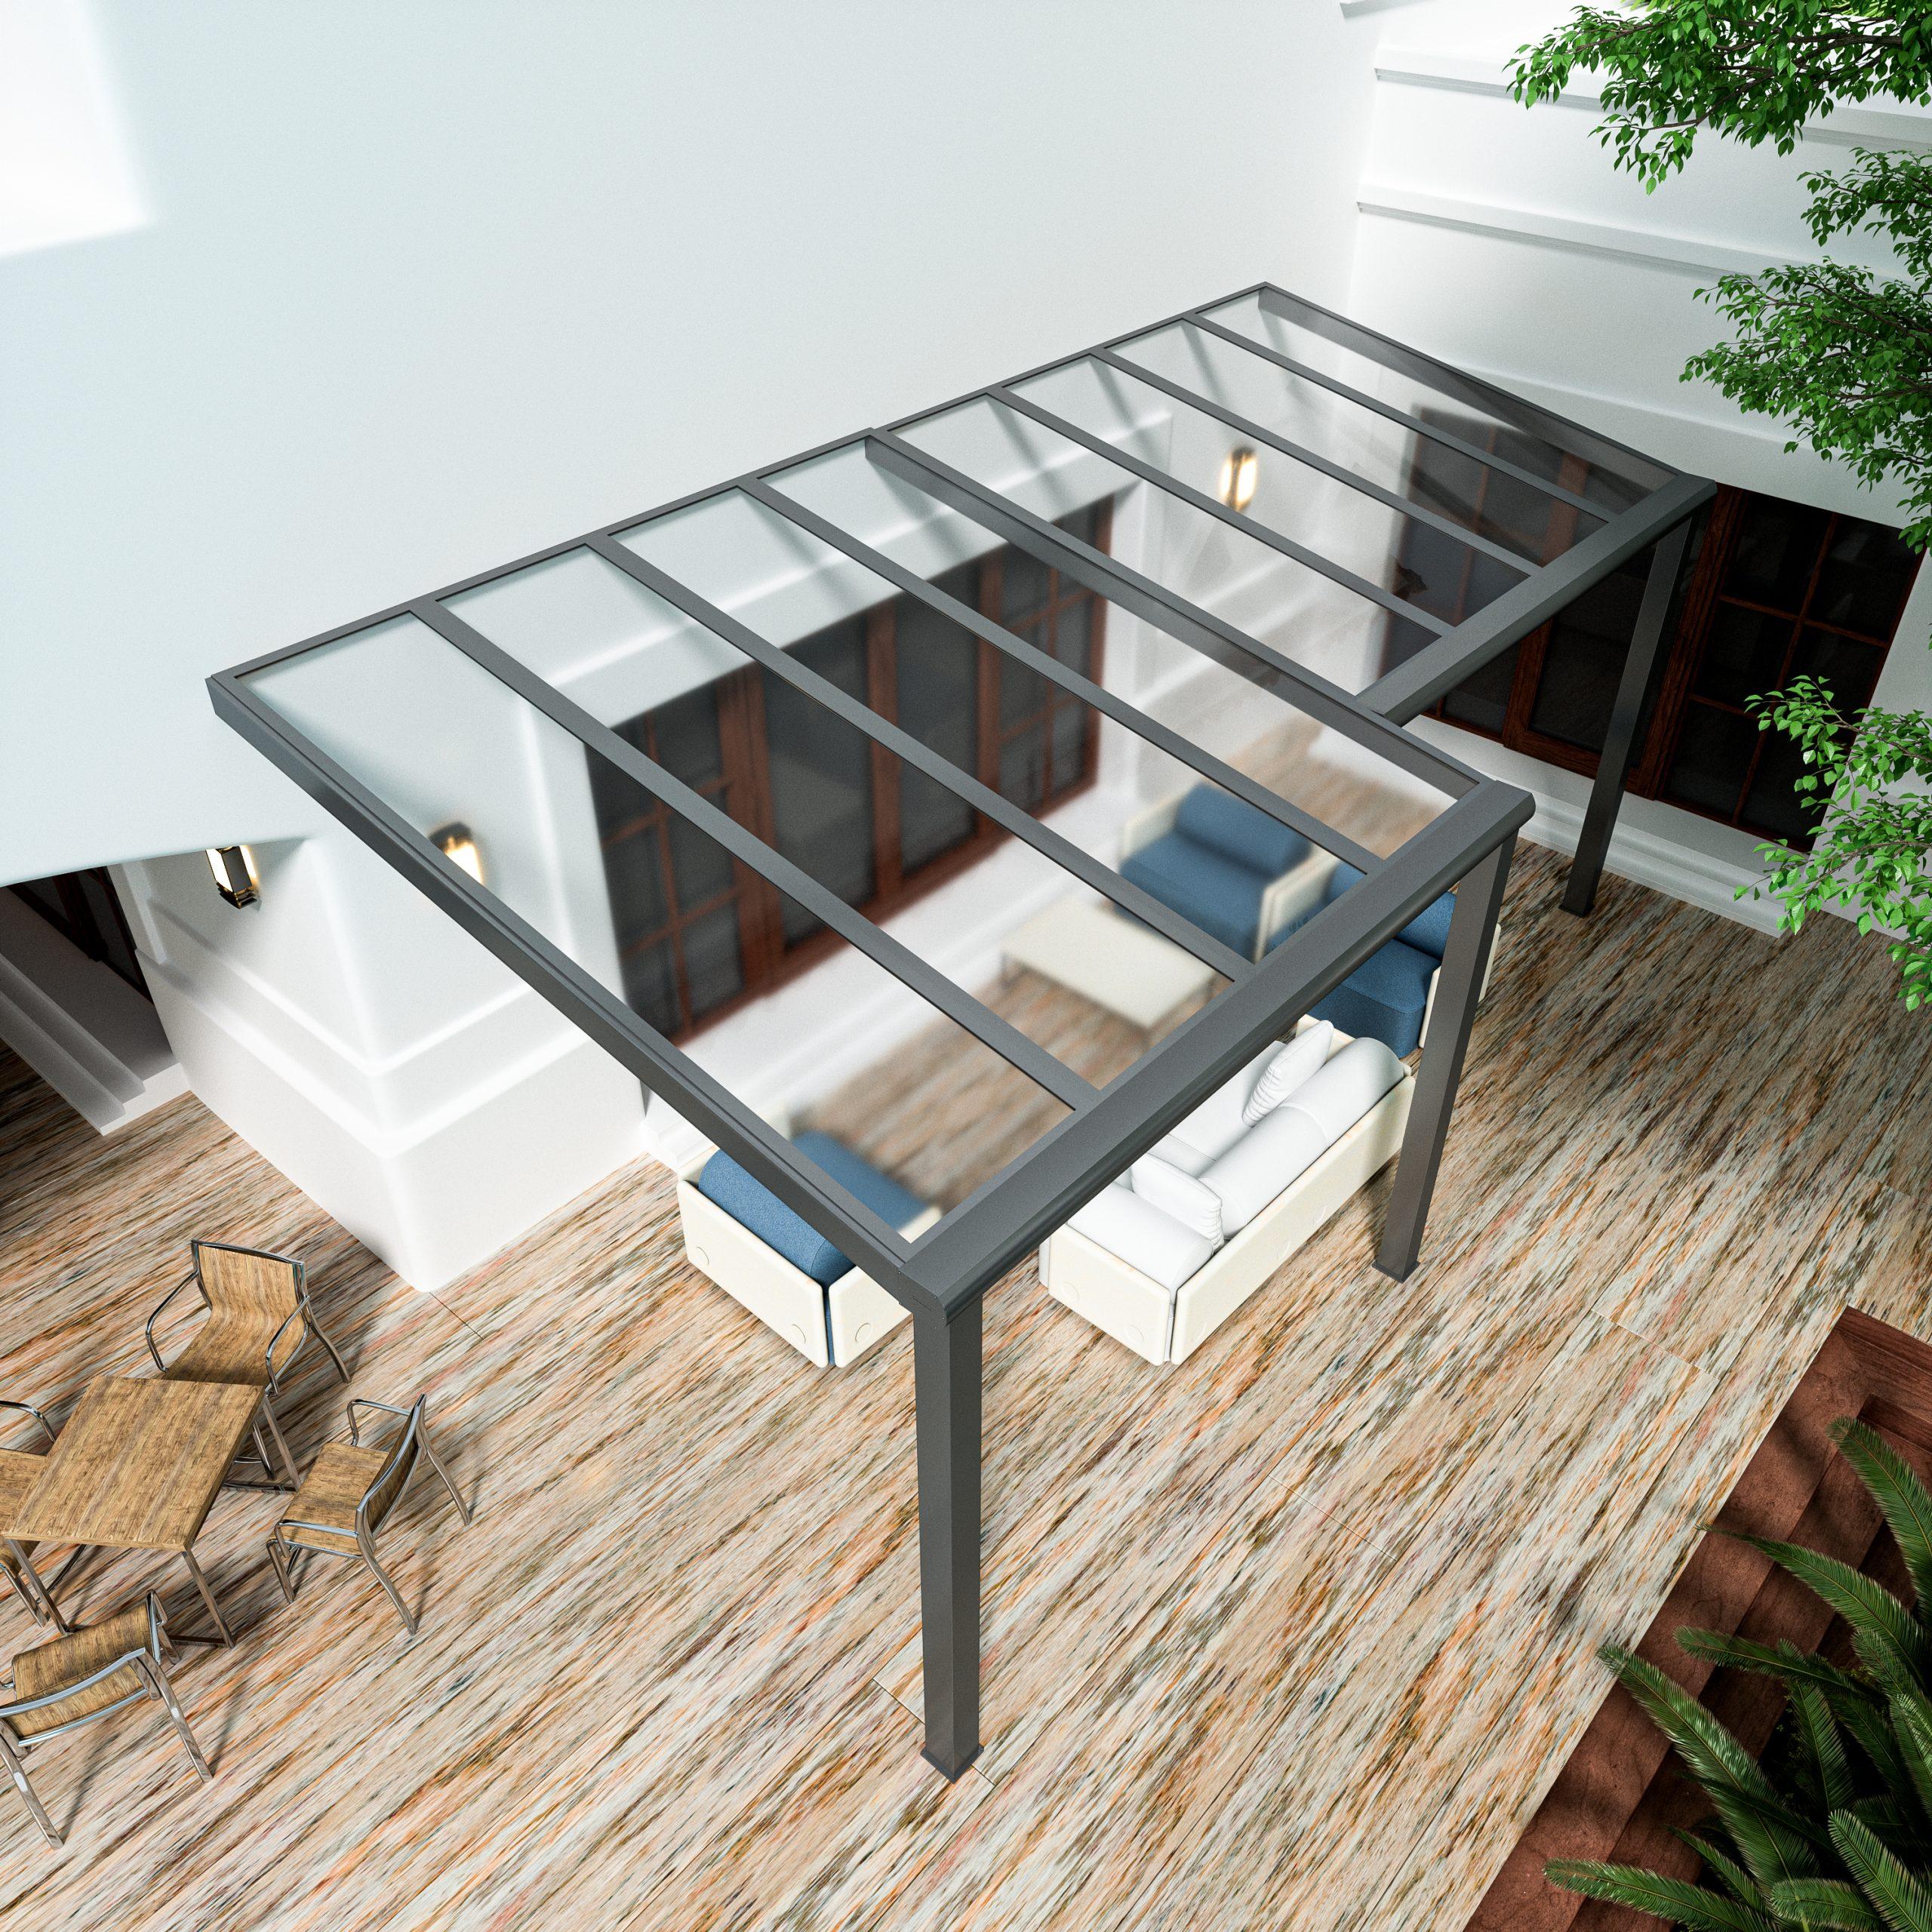 Alumaximal Terrassenüberdachung Glas Serie Luxor